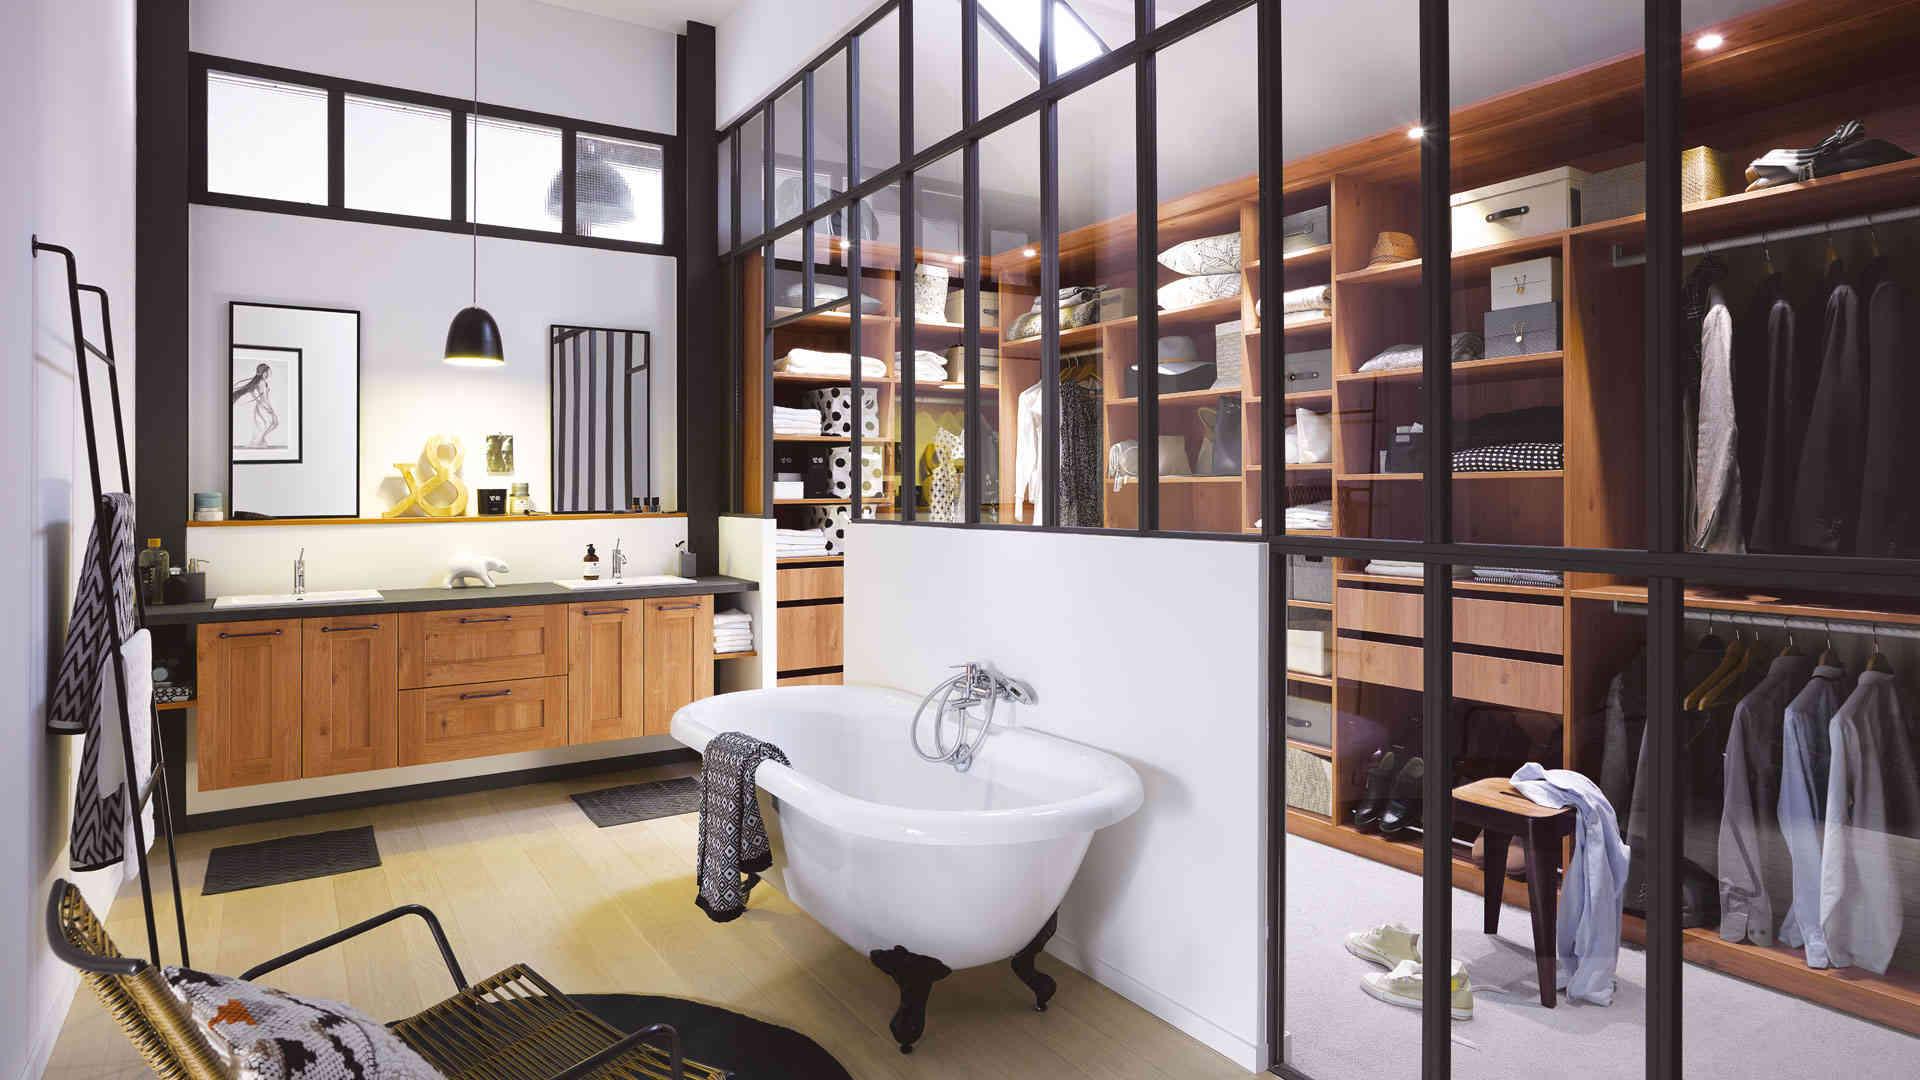 la salle de bain design des colos deco in. Black Bedroom Furniture Sets. Home Design Ideas